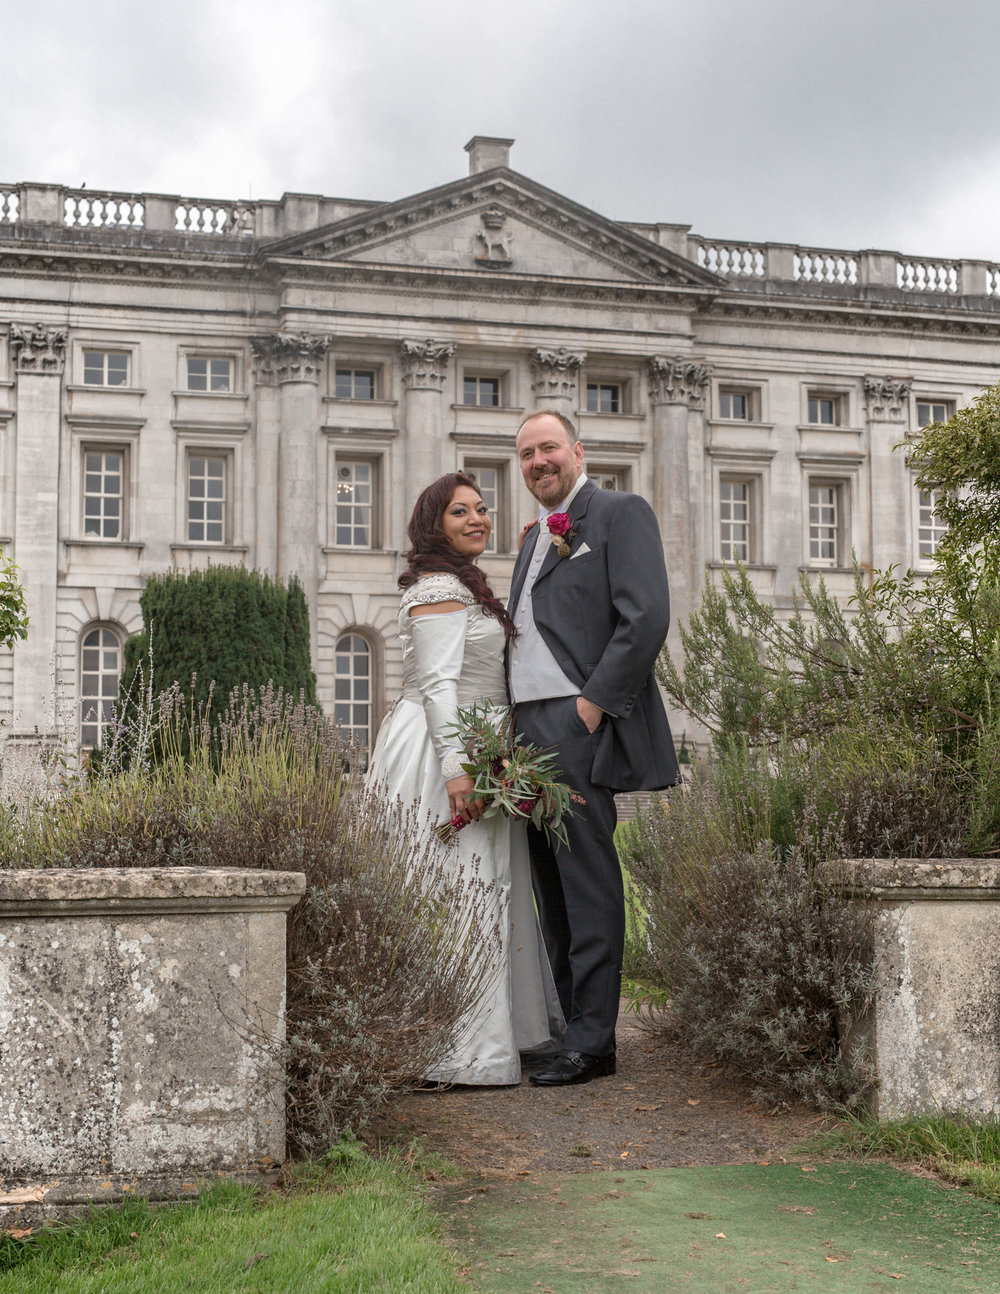 Moor Park Wedding Photography - Fran & Malc